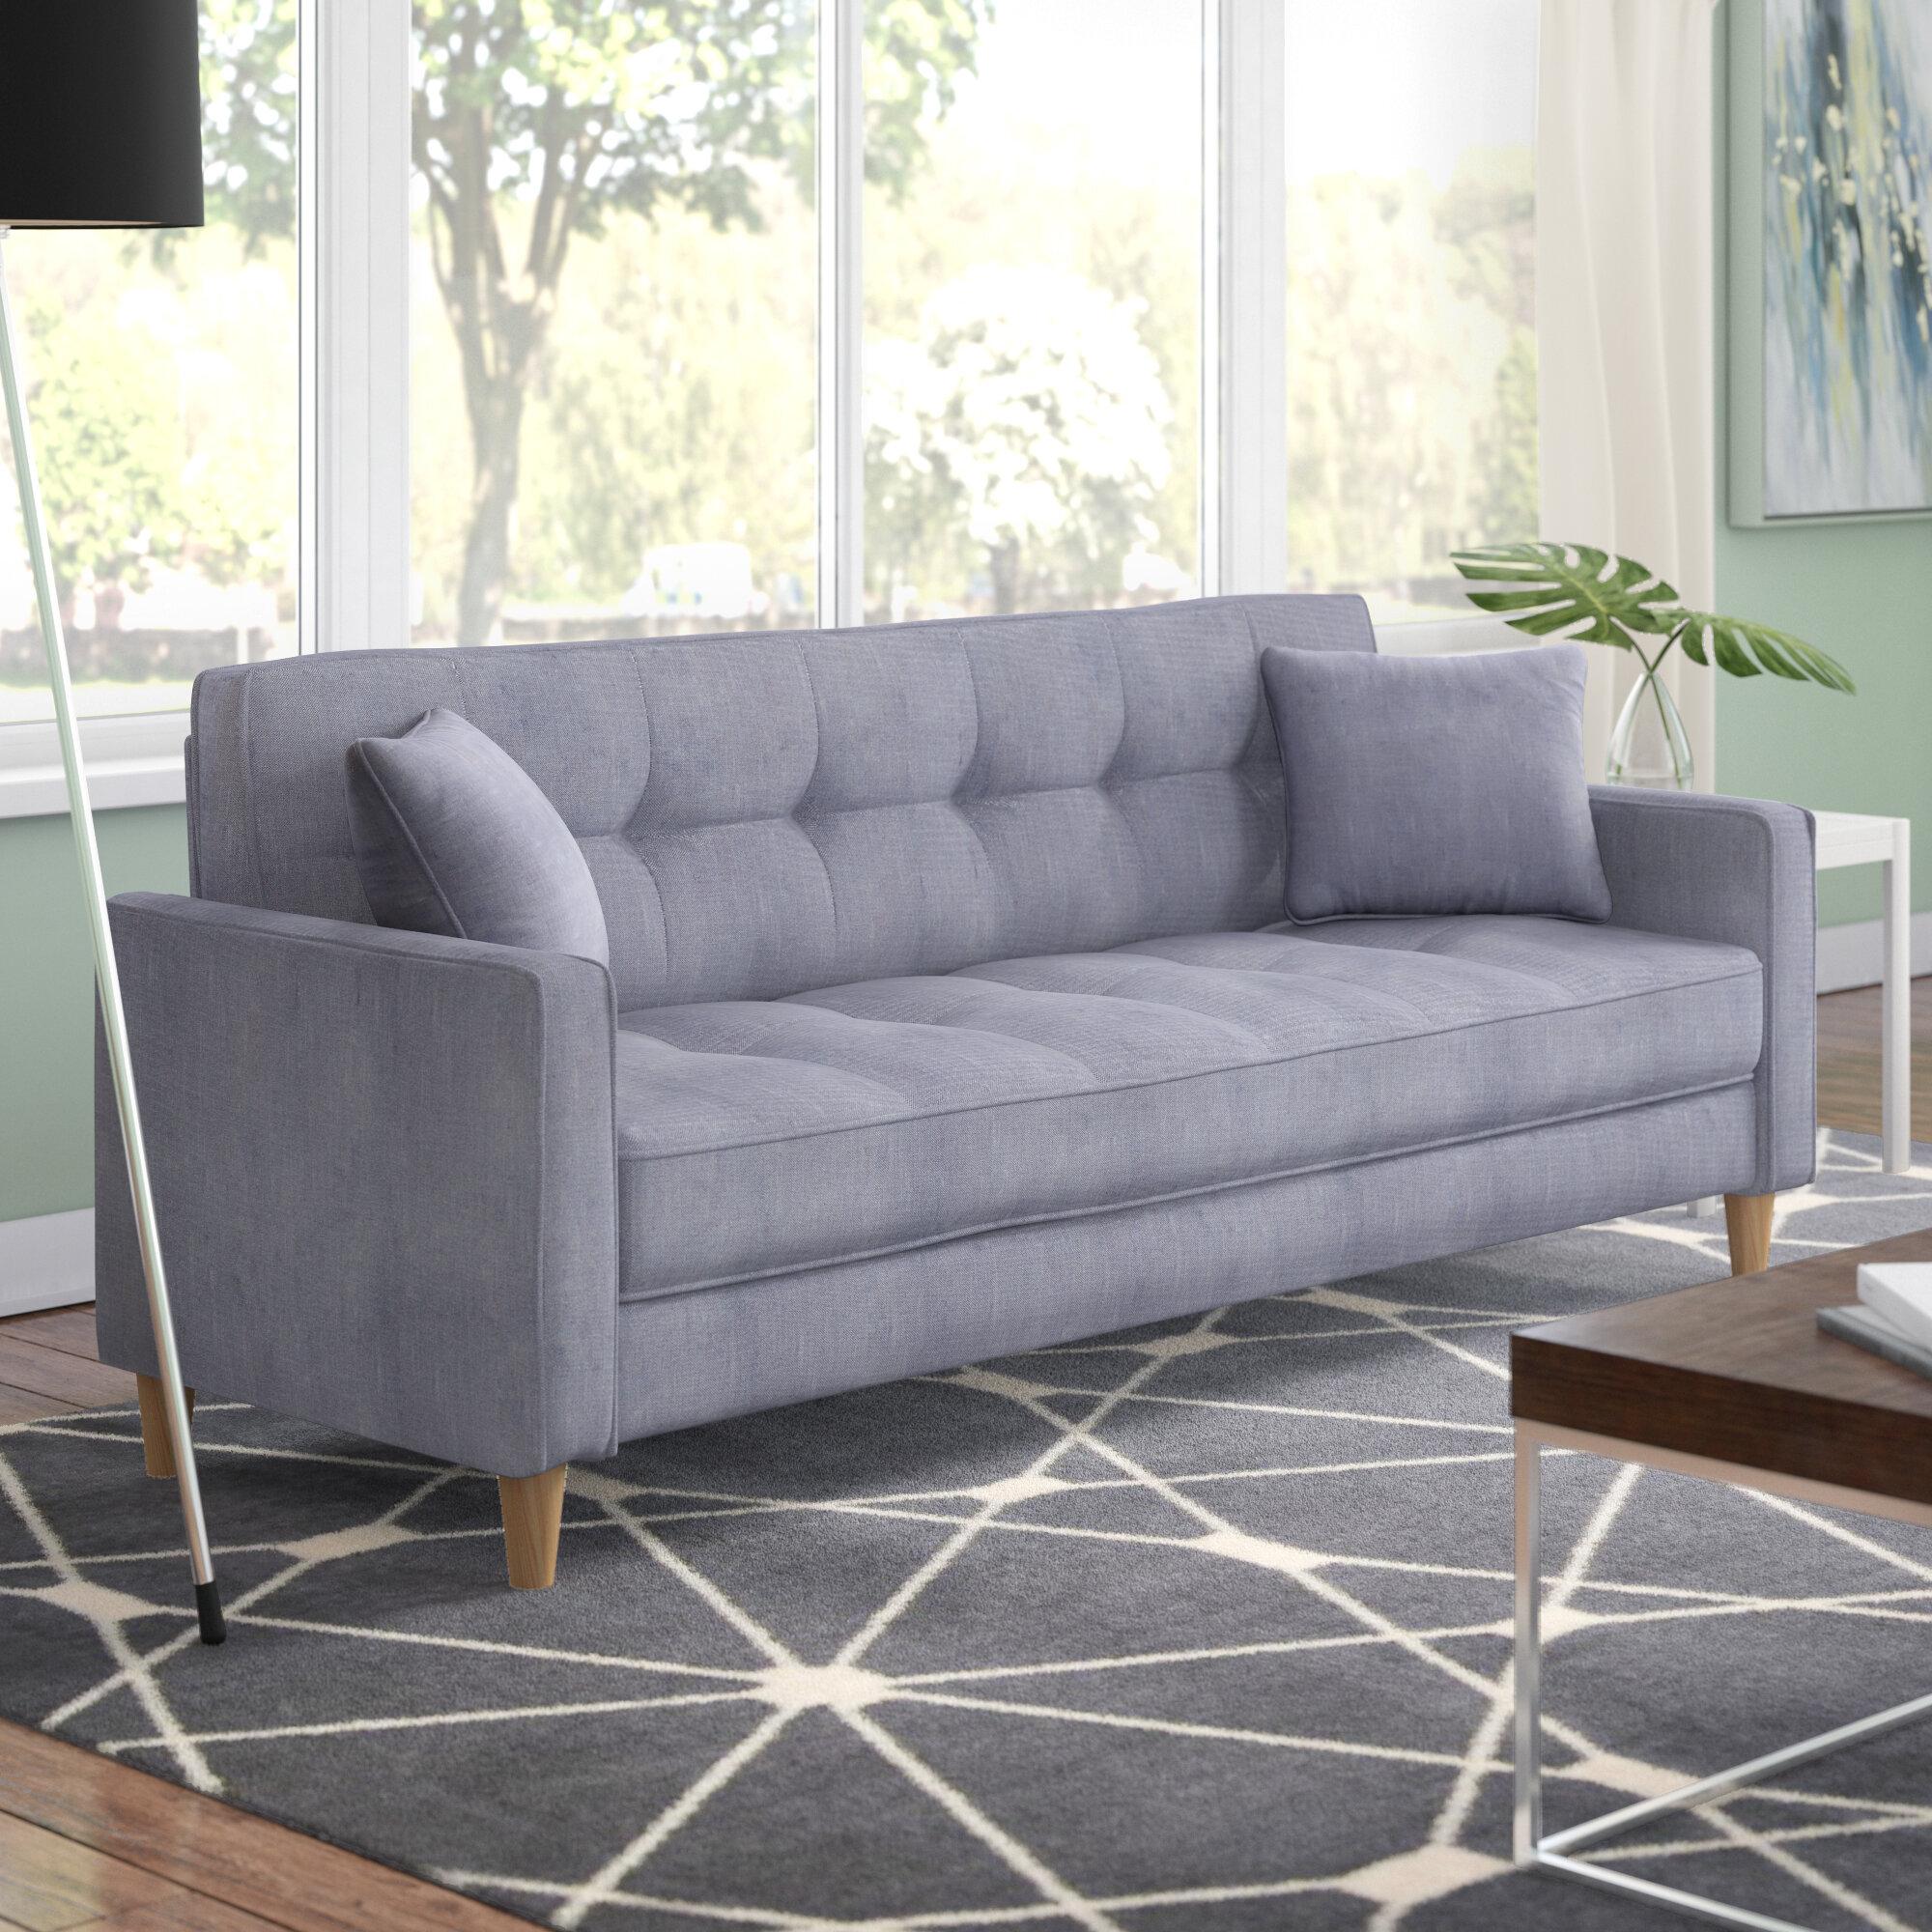 Incredible Ebern Designs Wooler Modern Linen Fabric Tufted Small Space Machost Co Dining Chair Design Ideas Machostcouk